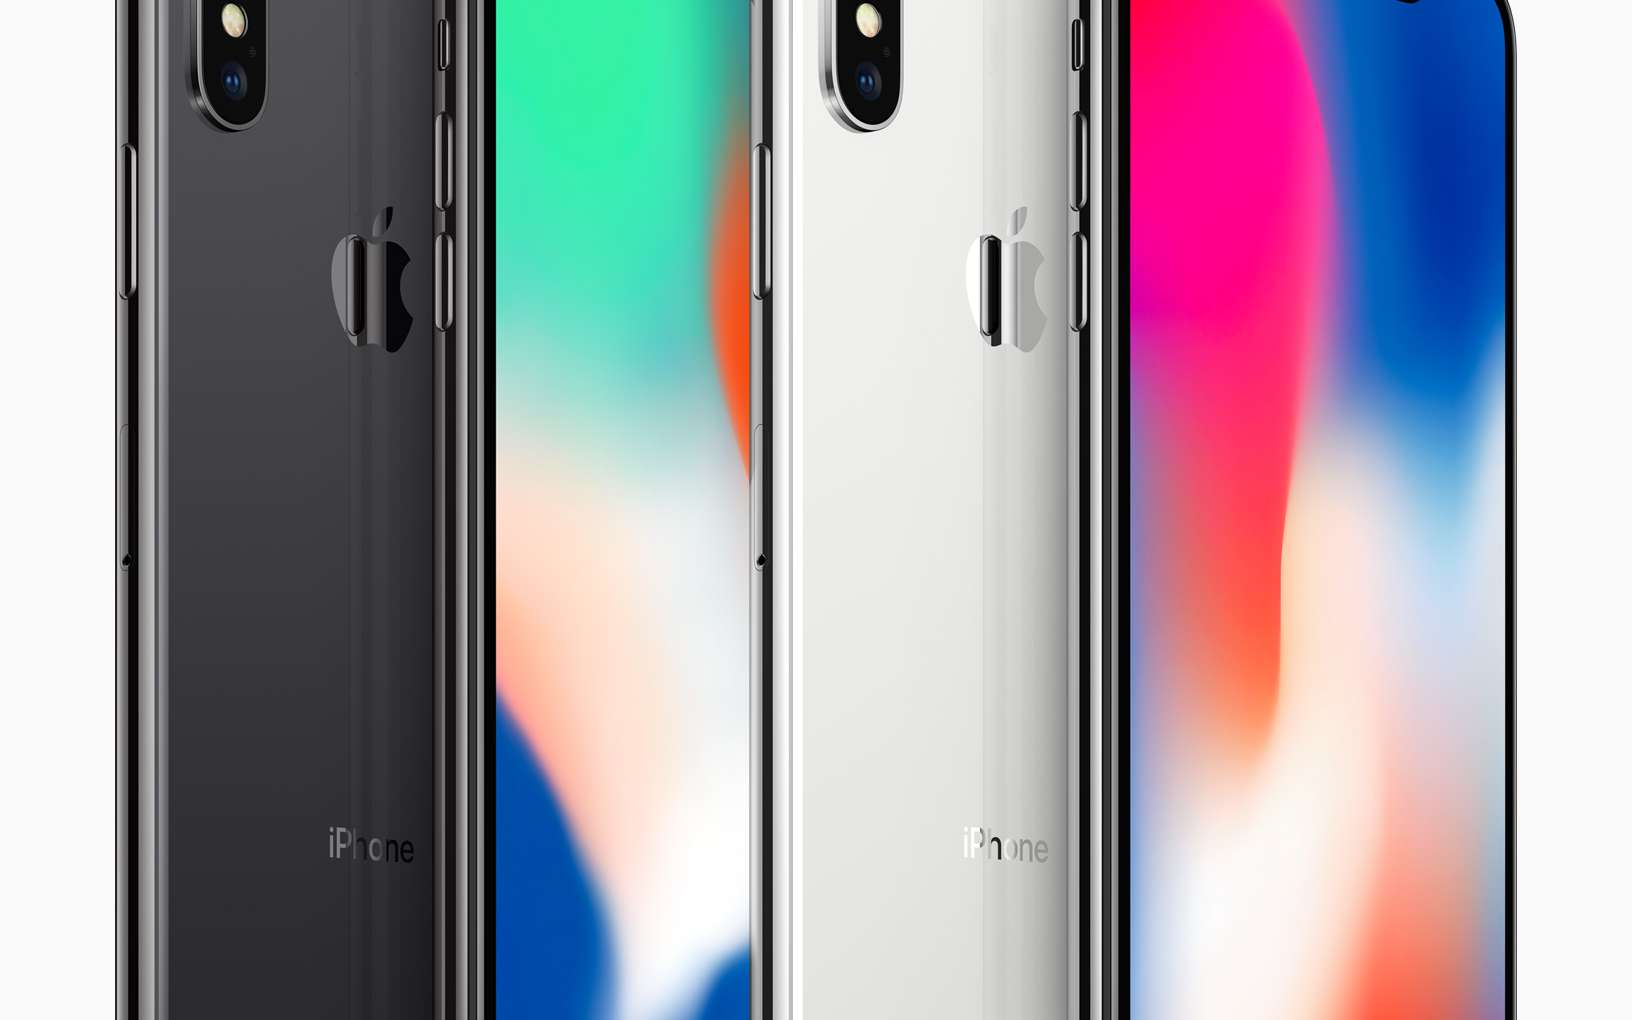 iPhone X © Apple